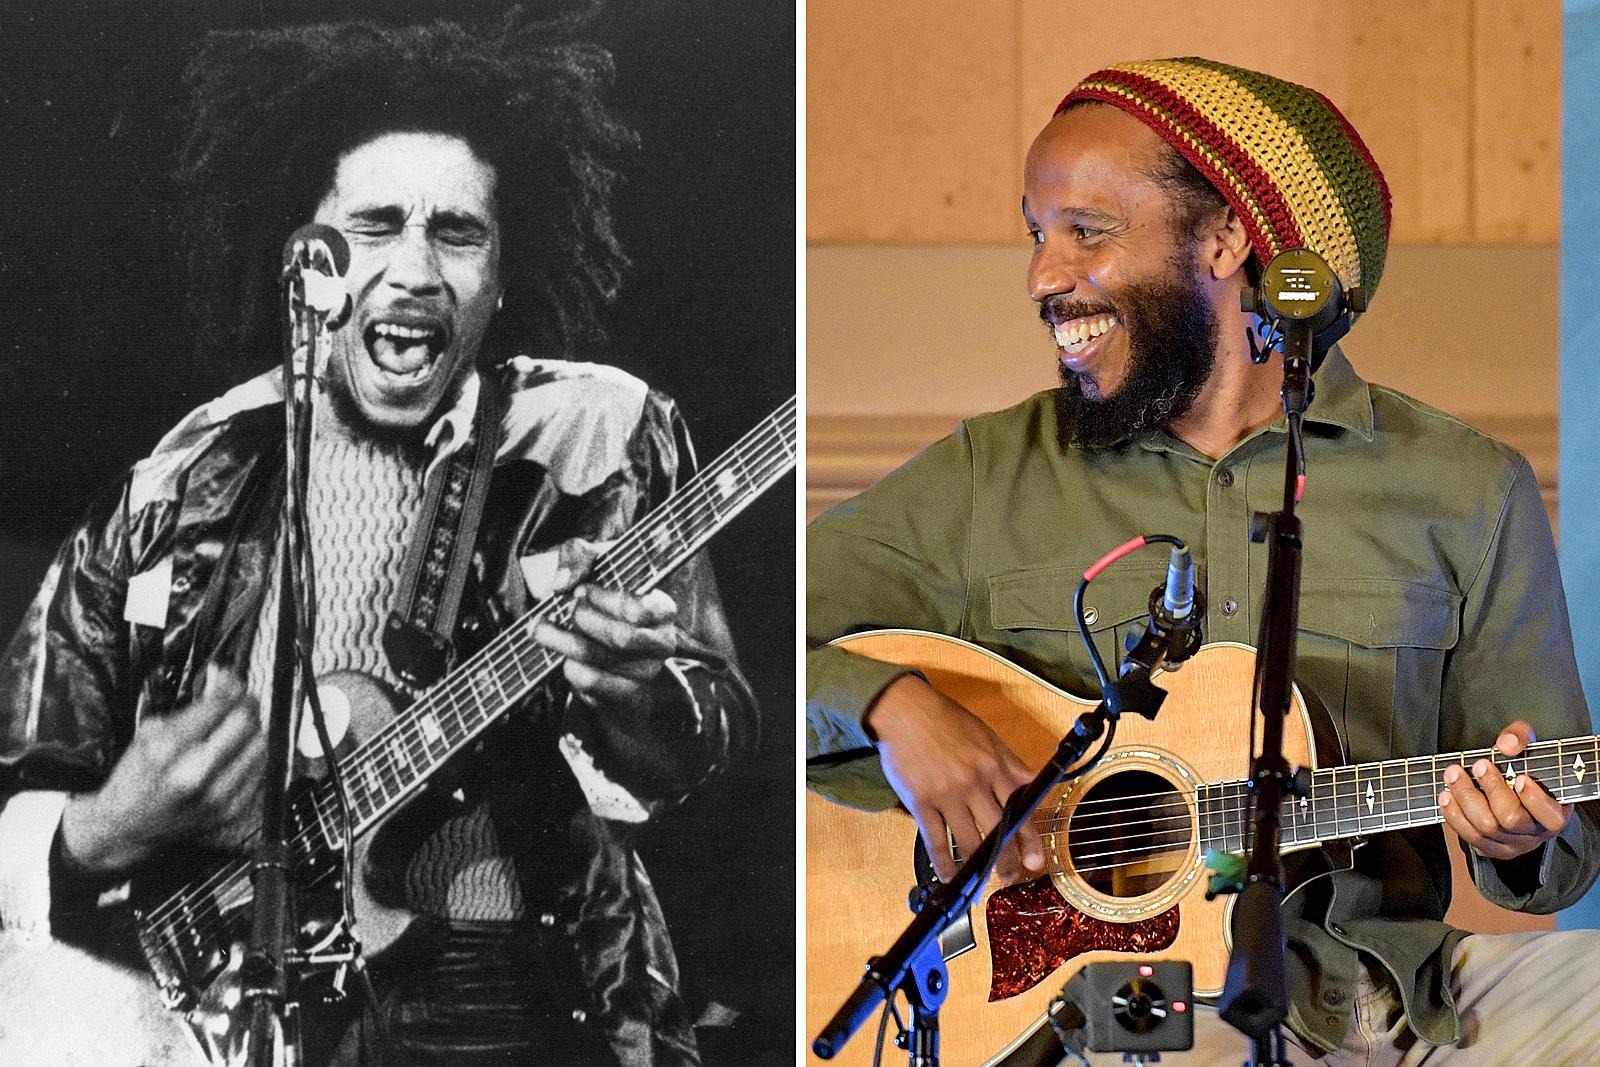 a7a2136e44ea8 Bob Marley Biopic Being Developed by Ziggy Marley